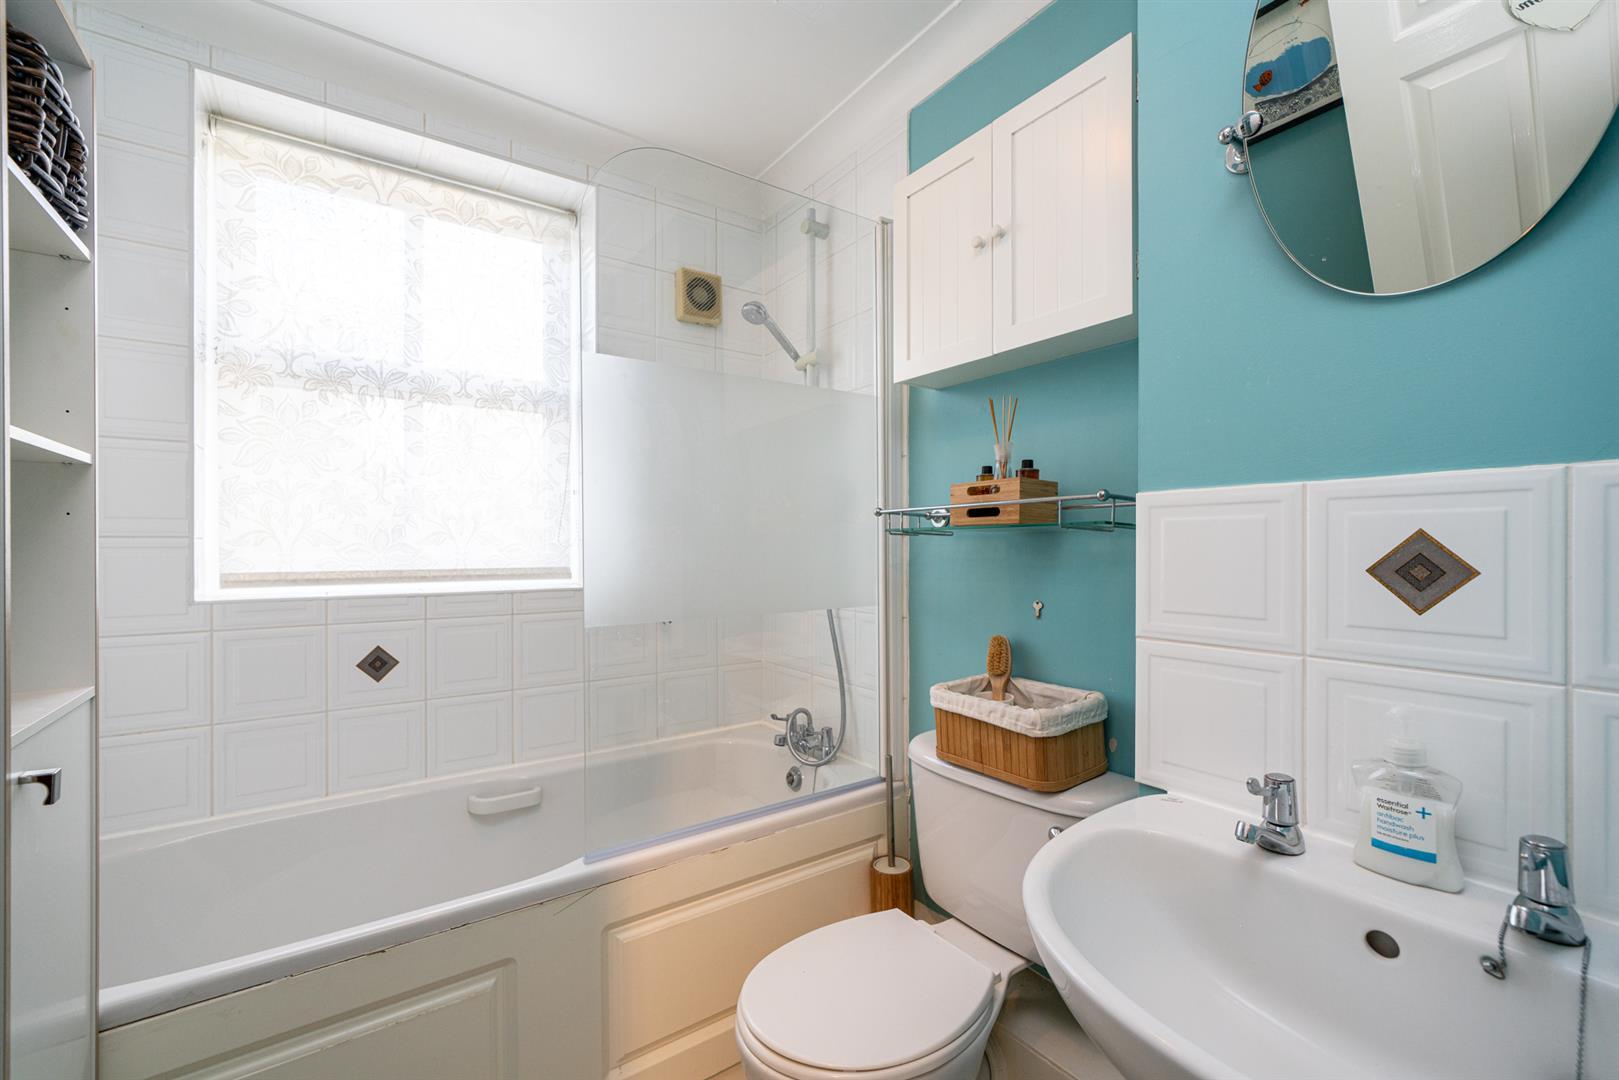 46-Cross-Oak-Road-1013- bathroom.jpg